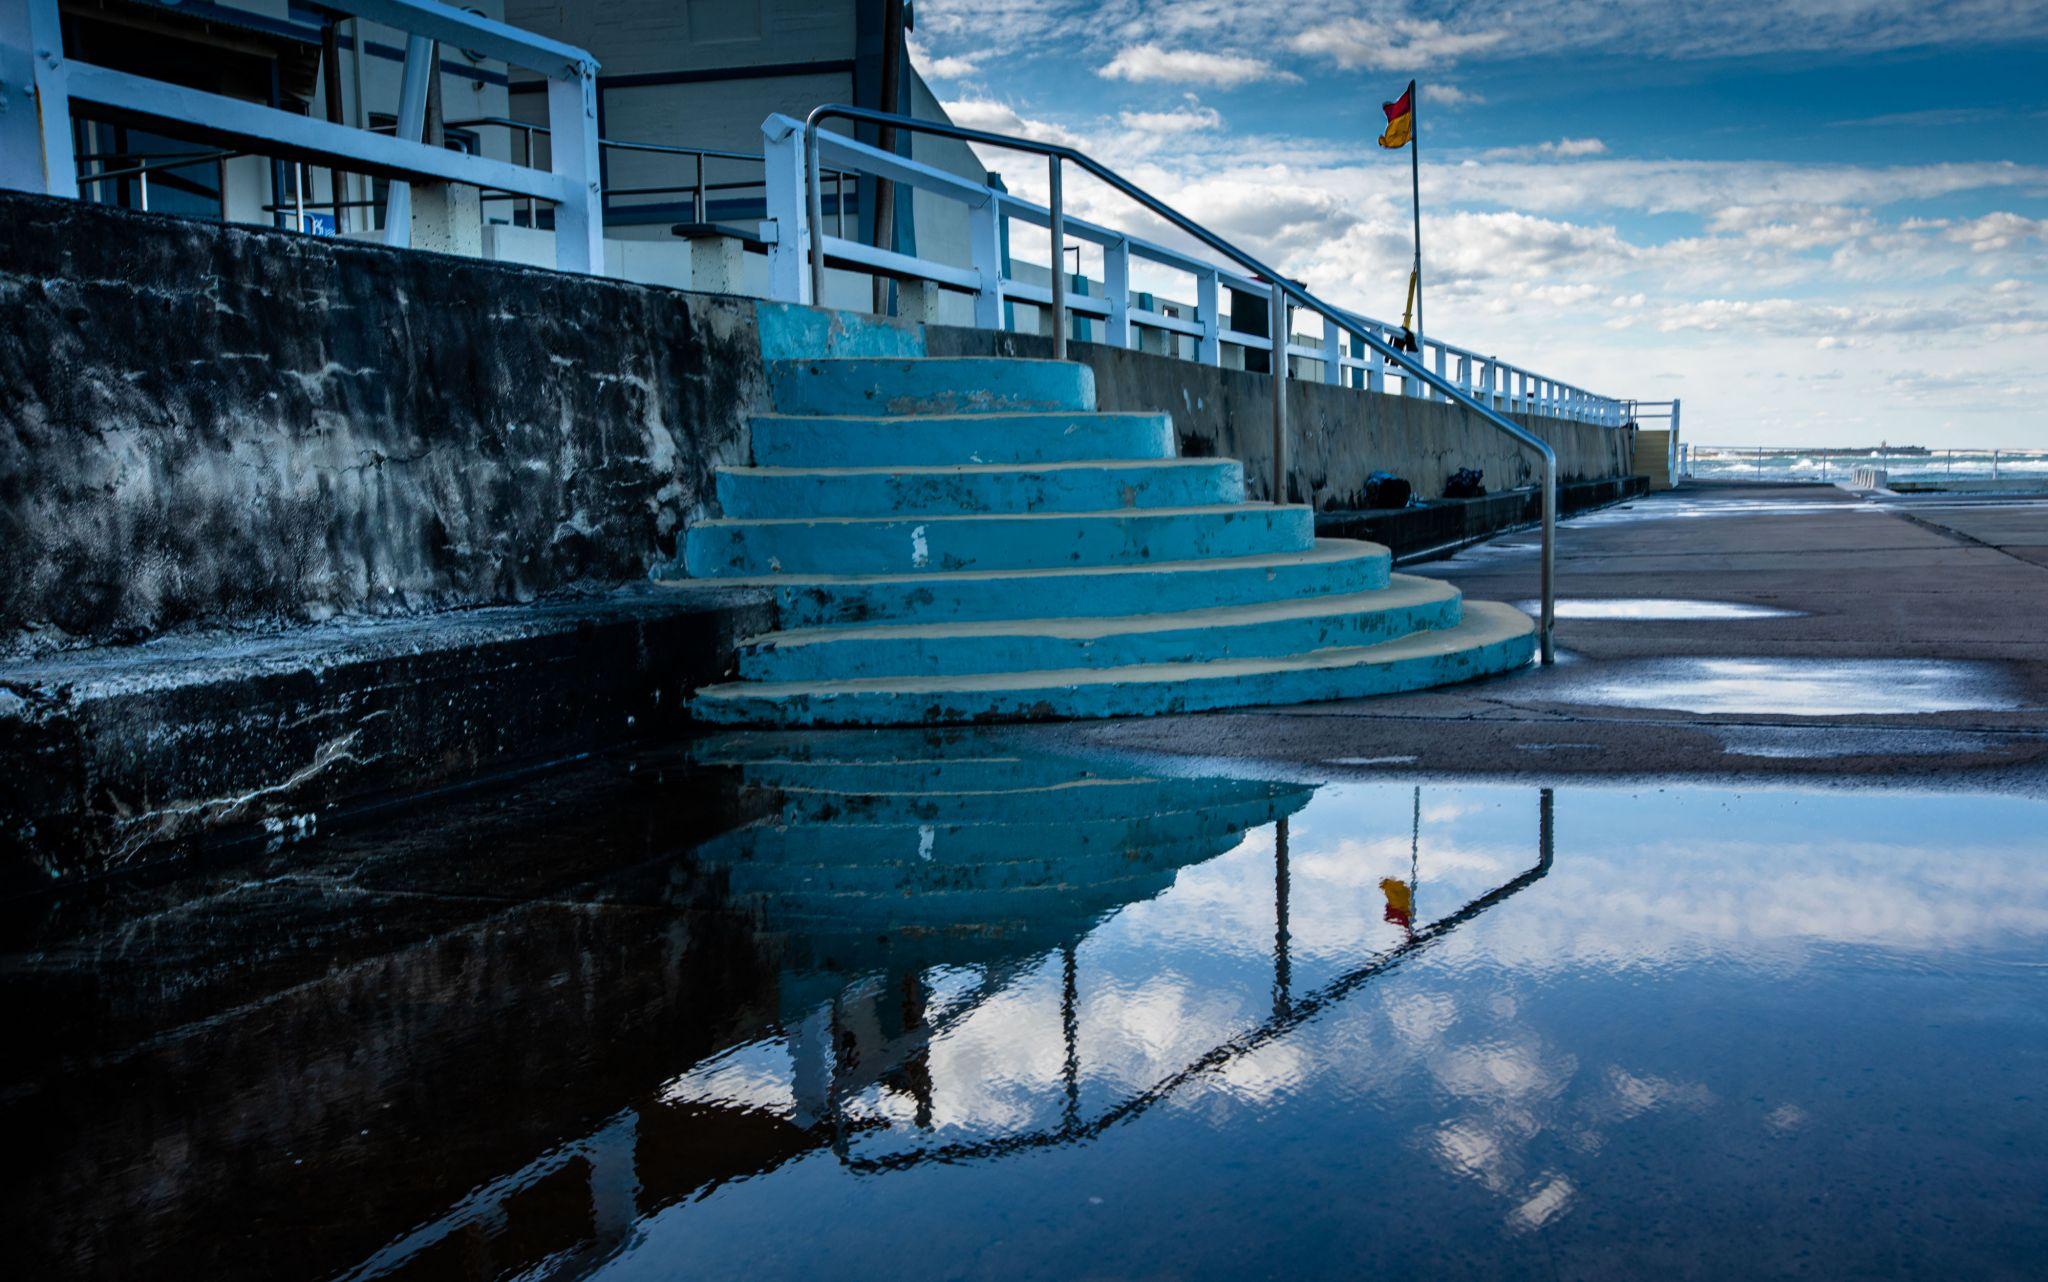 Newcastle Pool steps reflection Newcastle New South Wales, Australia